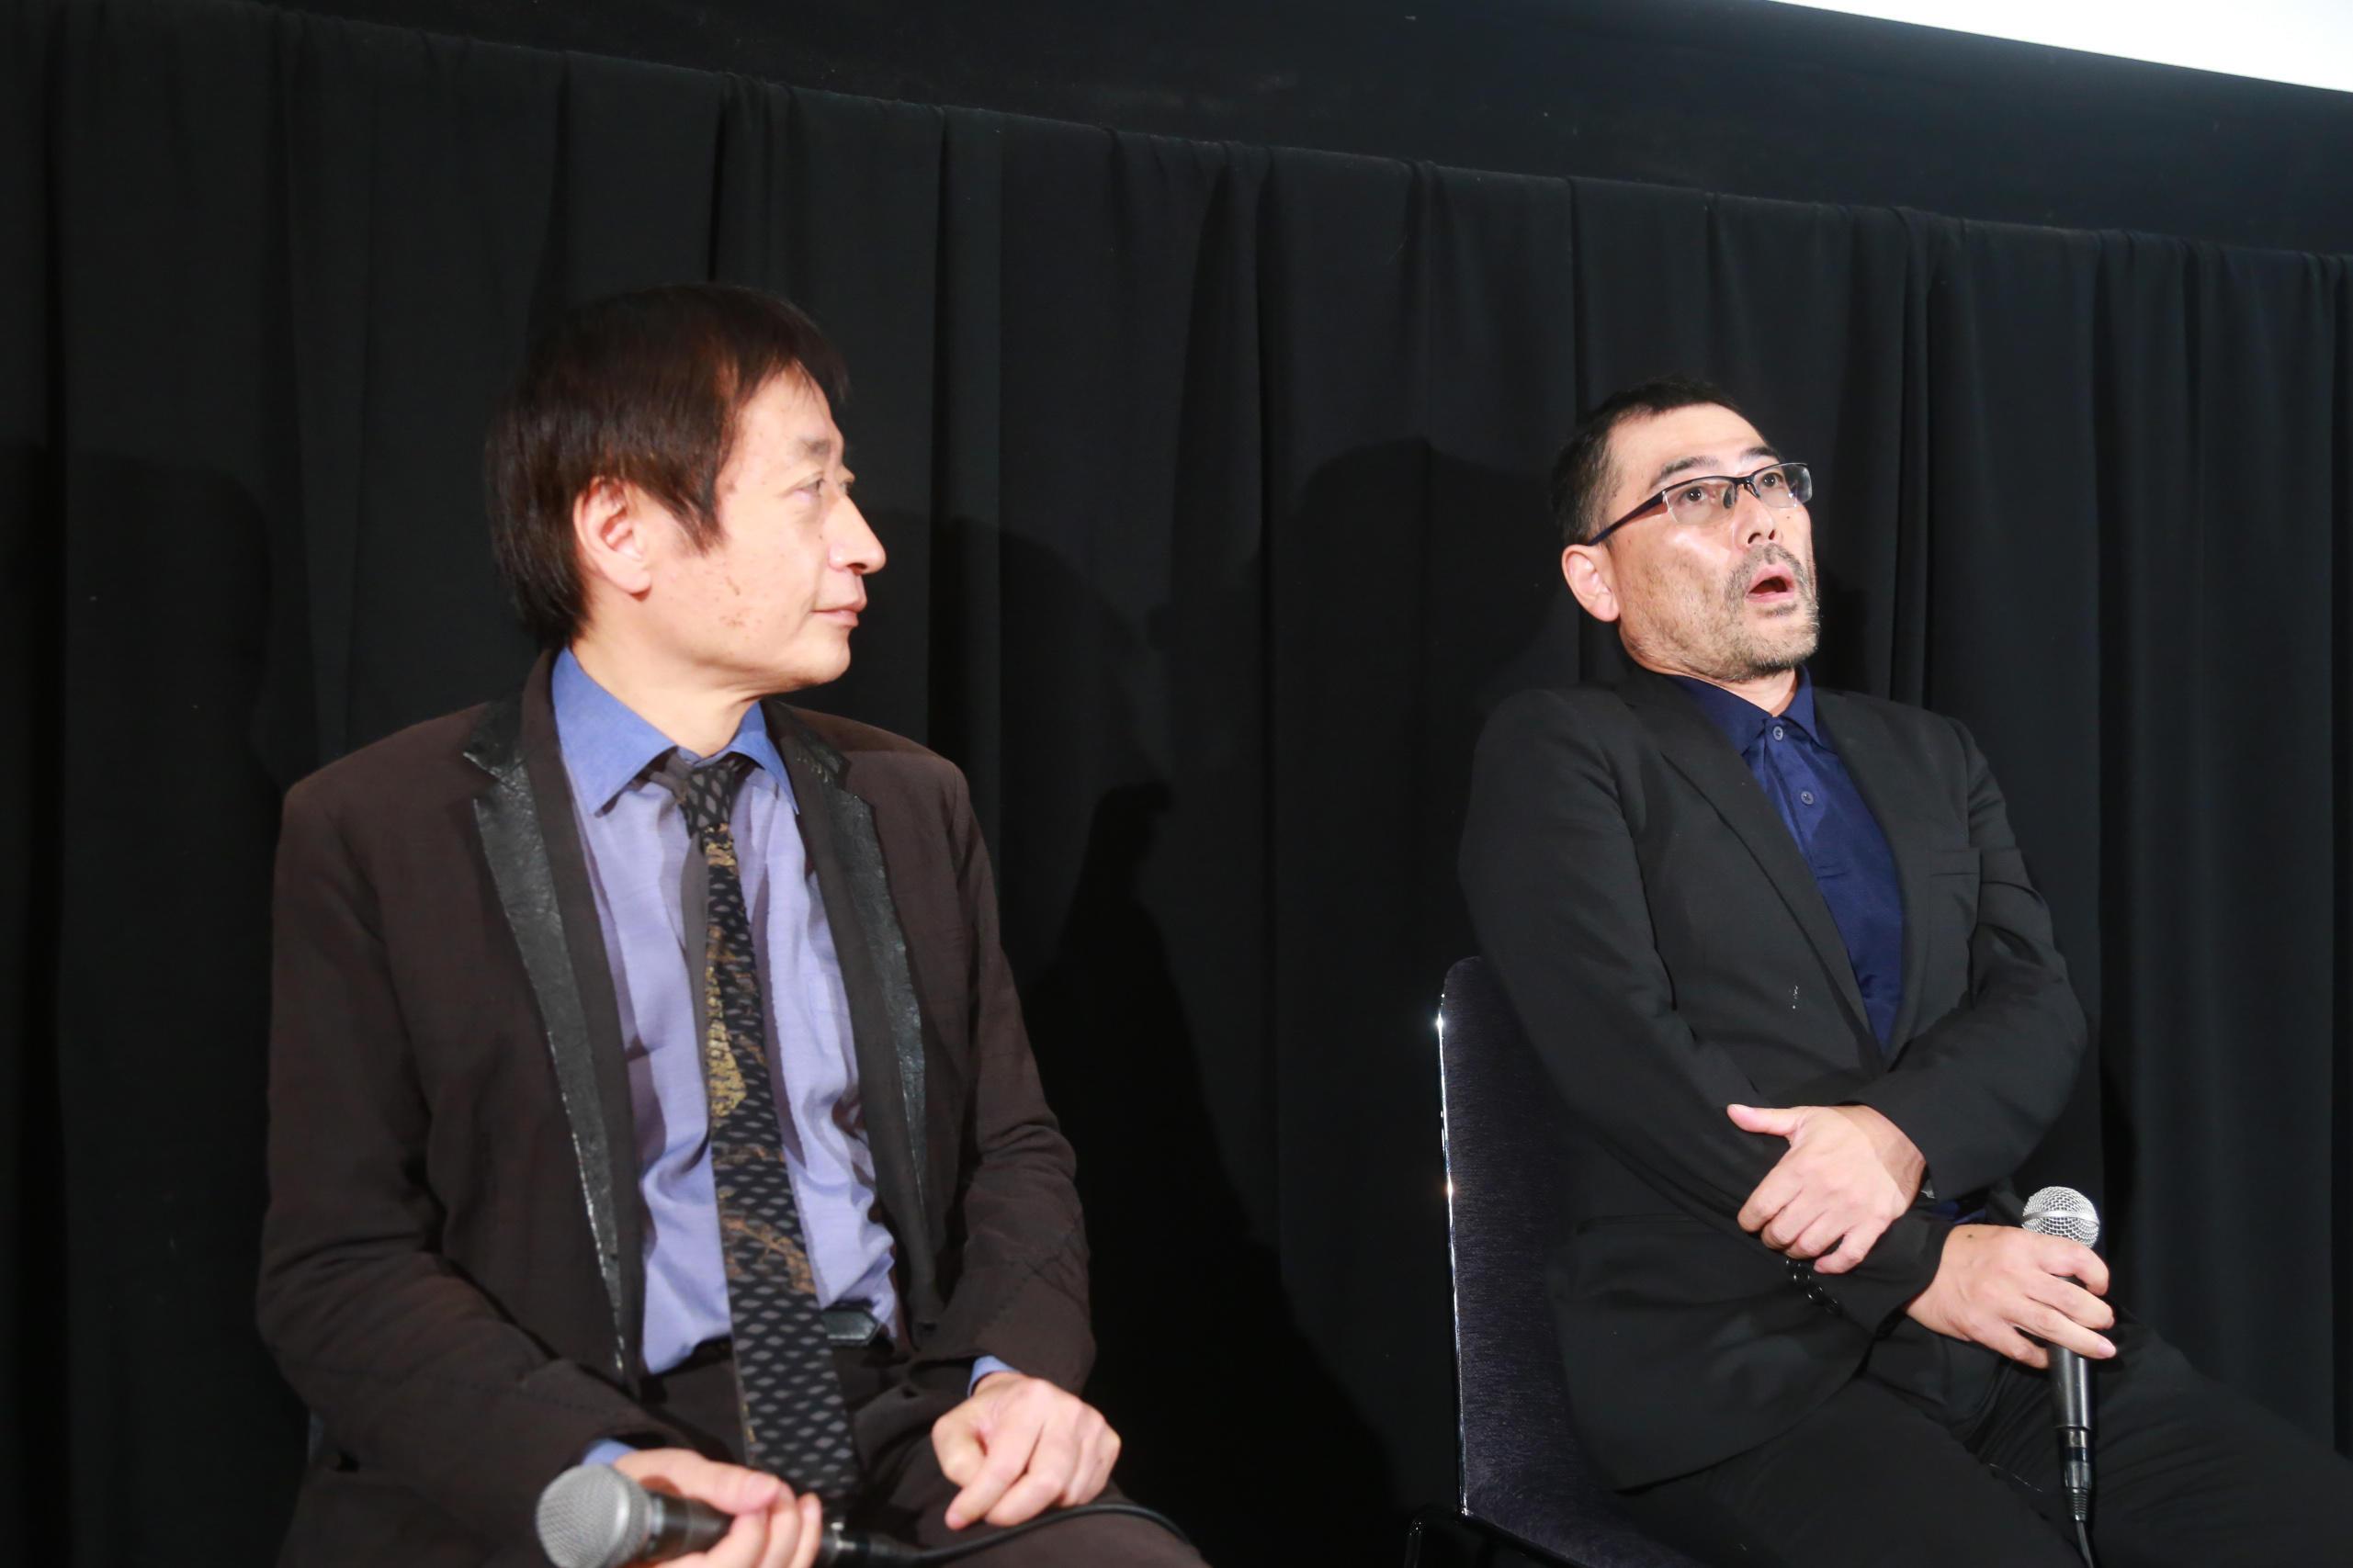 http://news.yoshimoto.co.jp/20181029123746-4b568849394ad3d7e7d919658d090a67d5aaf156.jpg